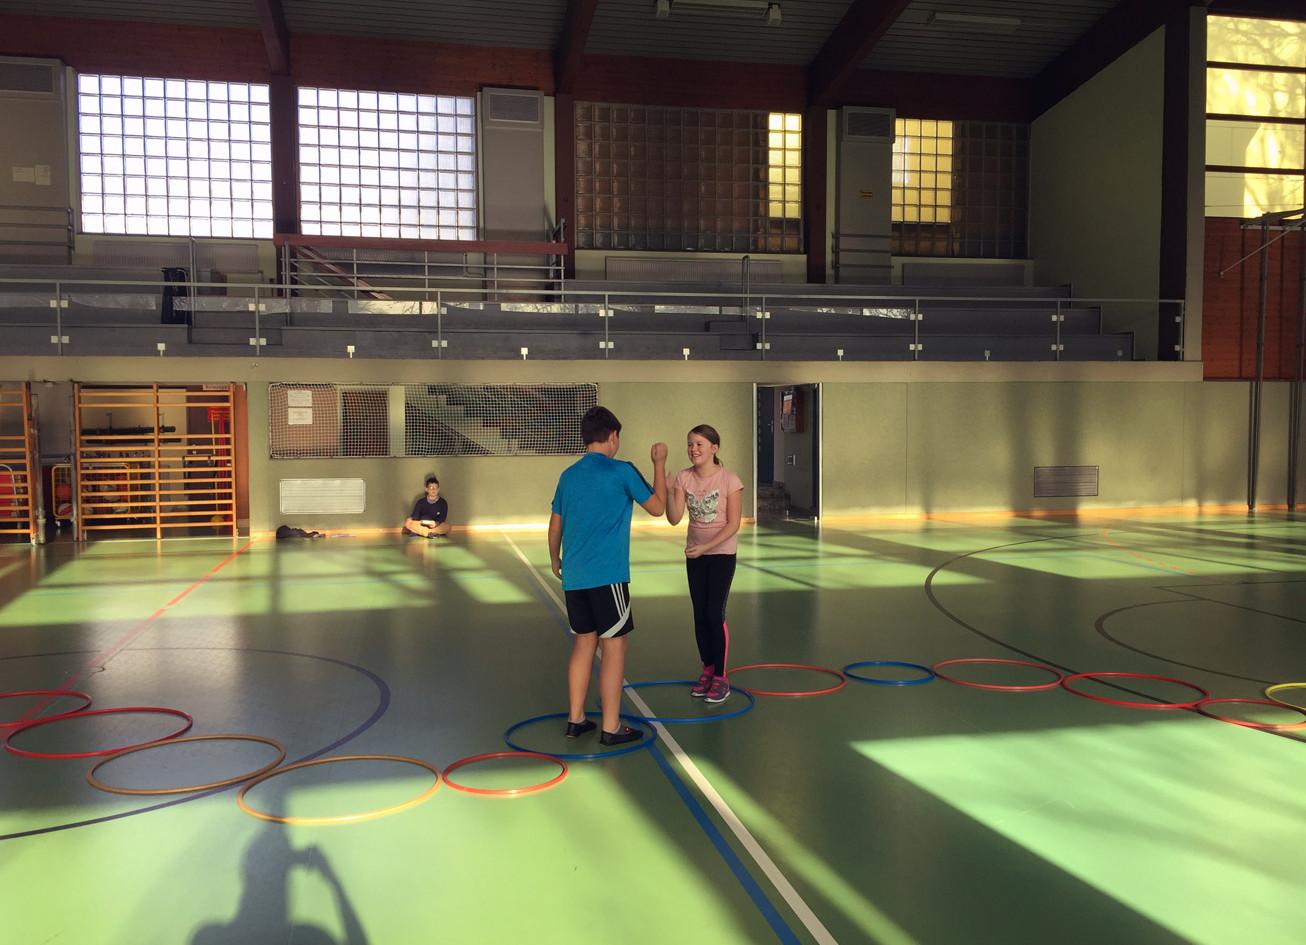 Sporthalle3.jpg